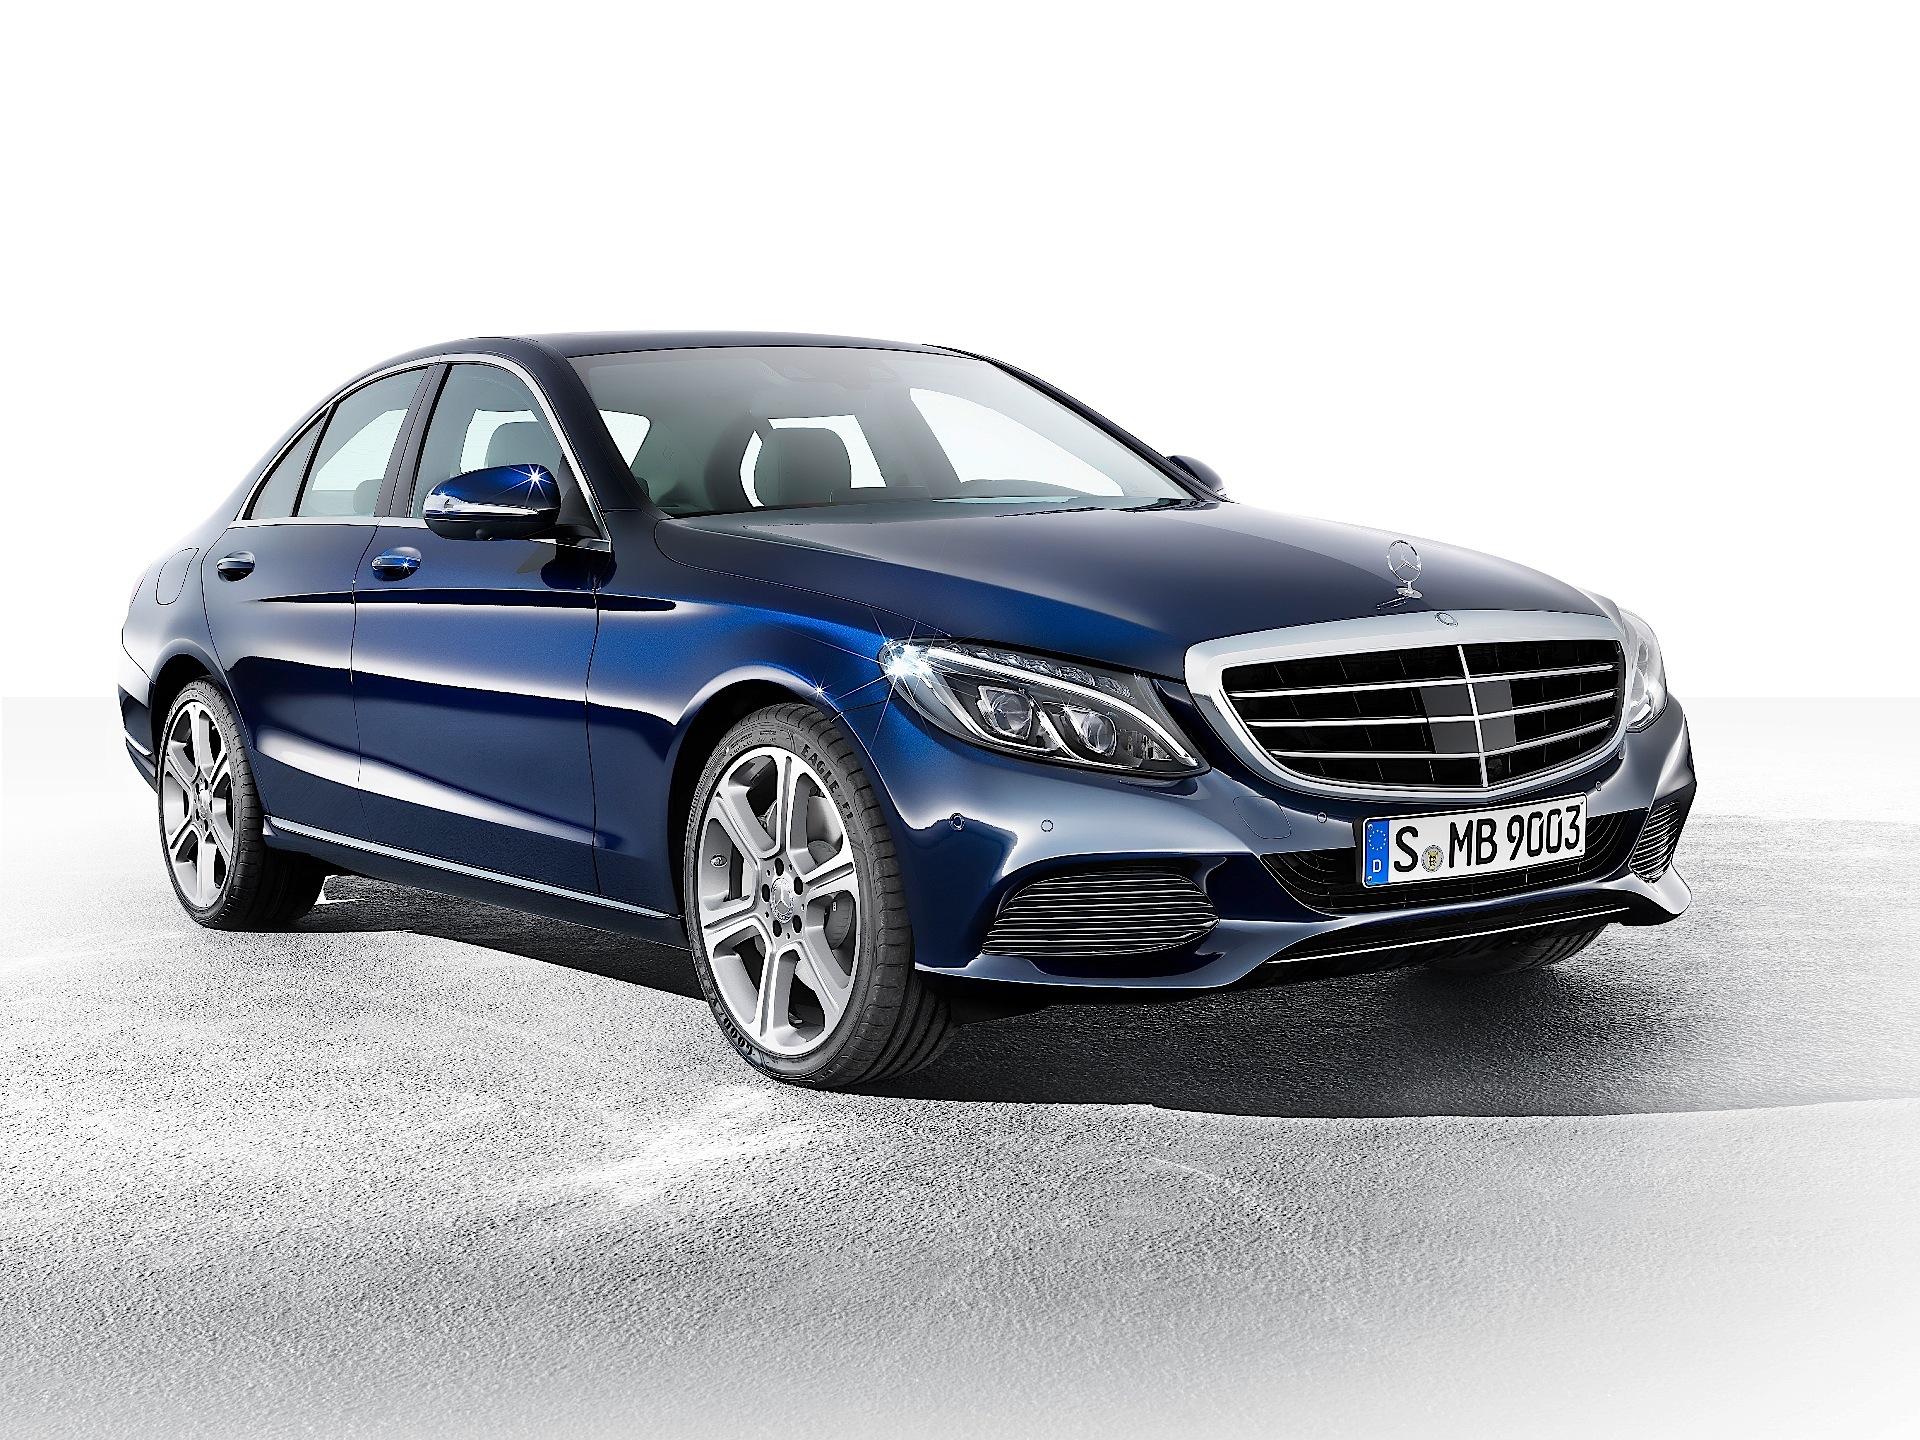 High Quality Tuning Files Mercedes-Benz C (W205) 43 AMG (3 0